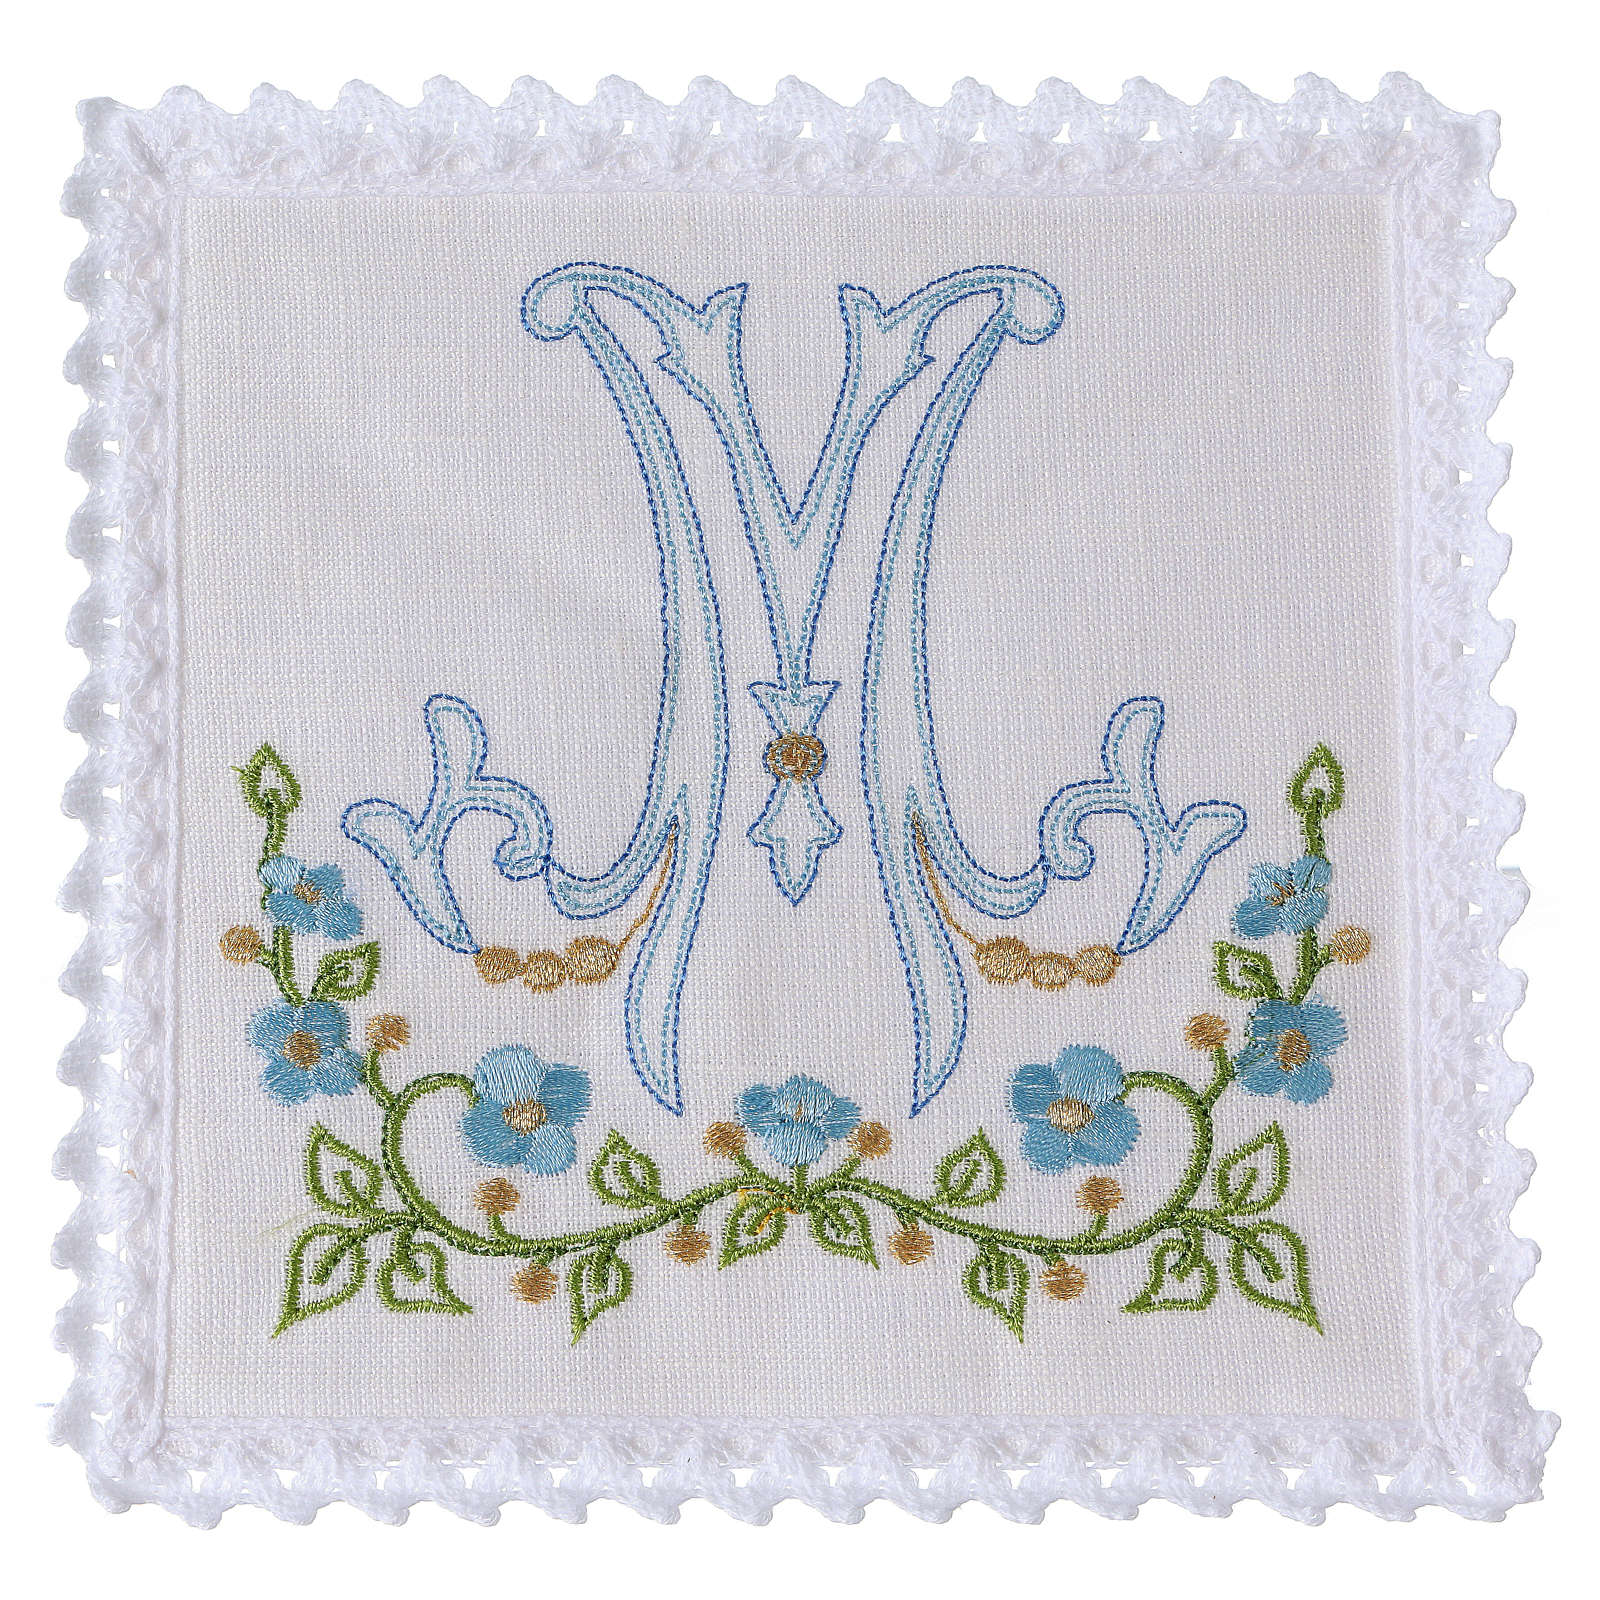 Servicio de altar algodón bordado azul M Mariana 4